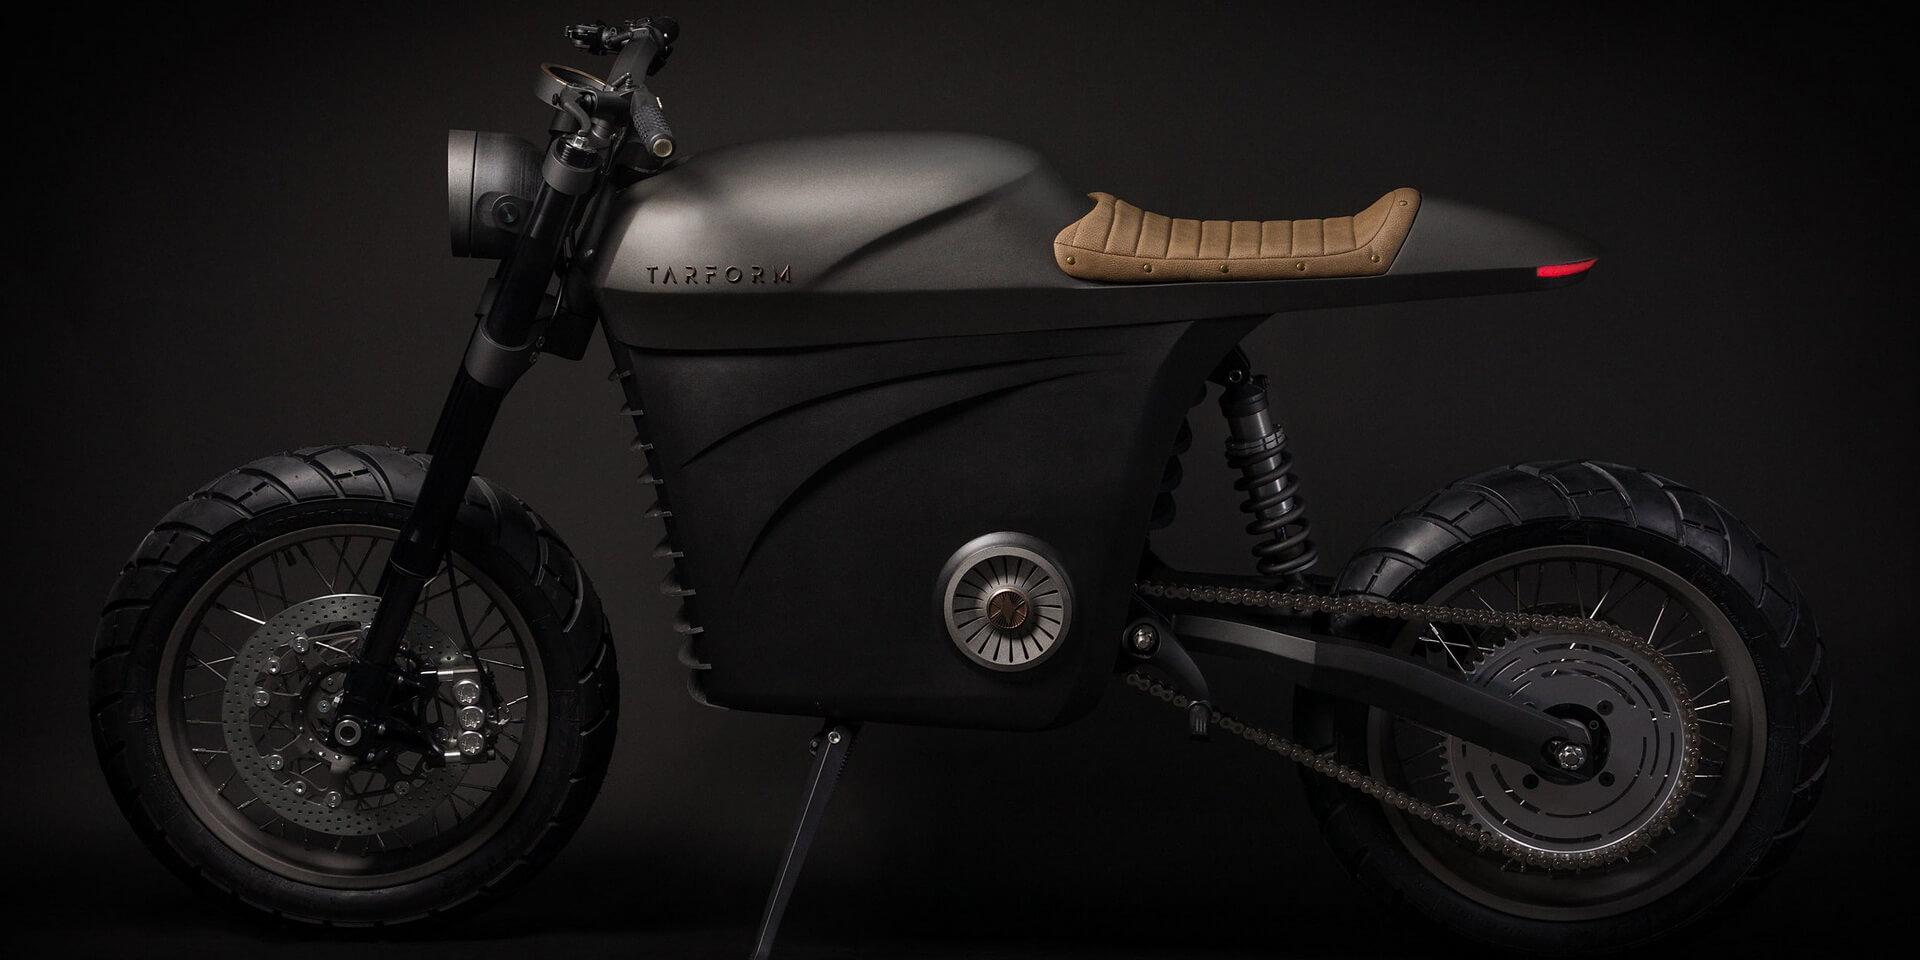 Электрический мотоцикл Tarform